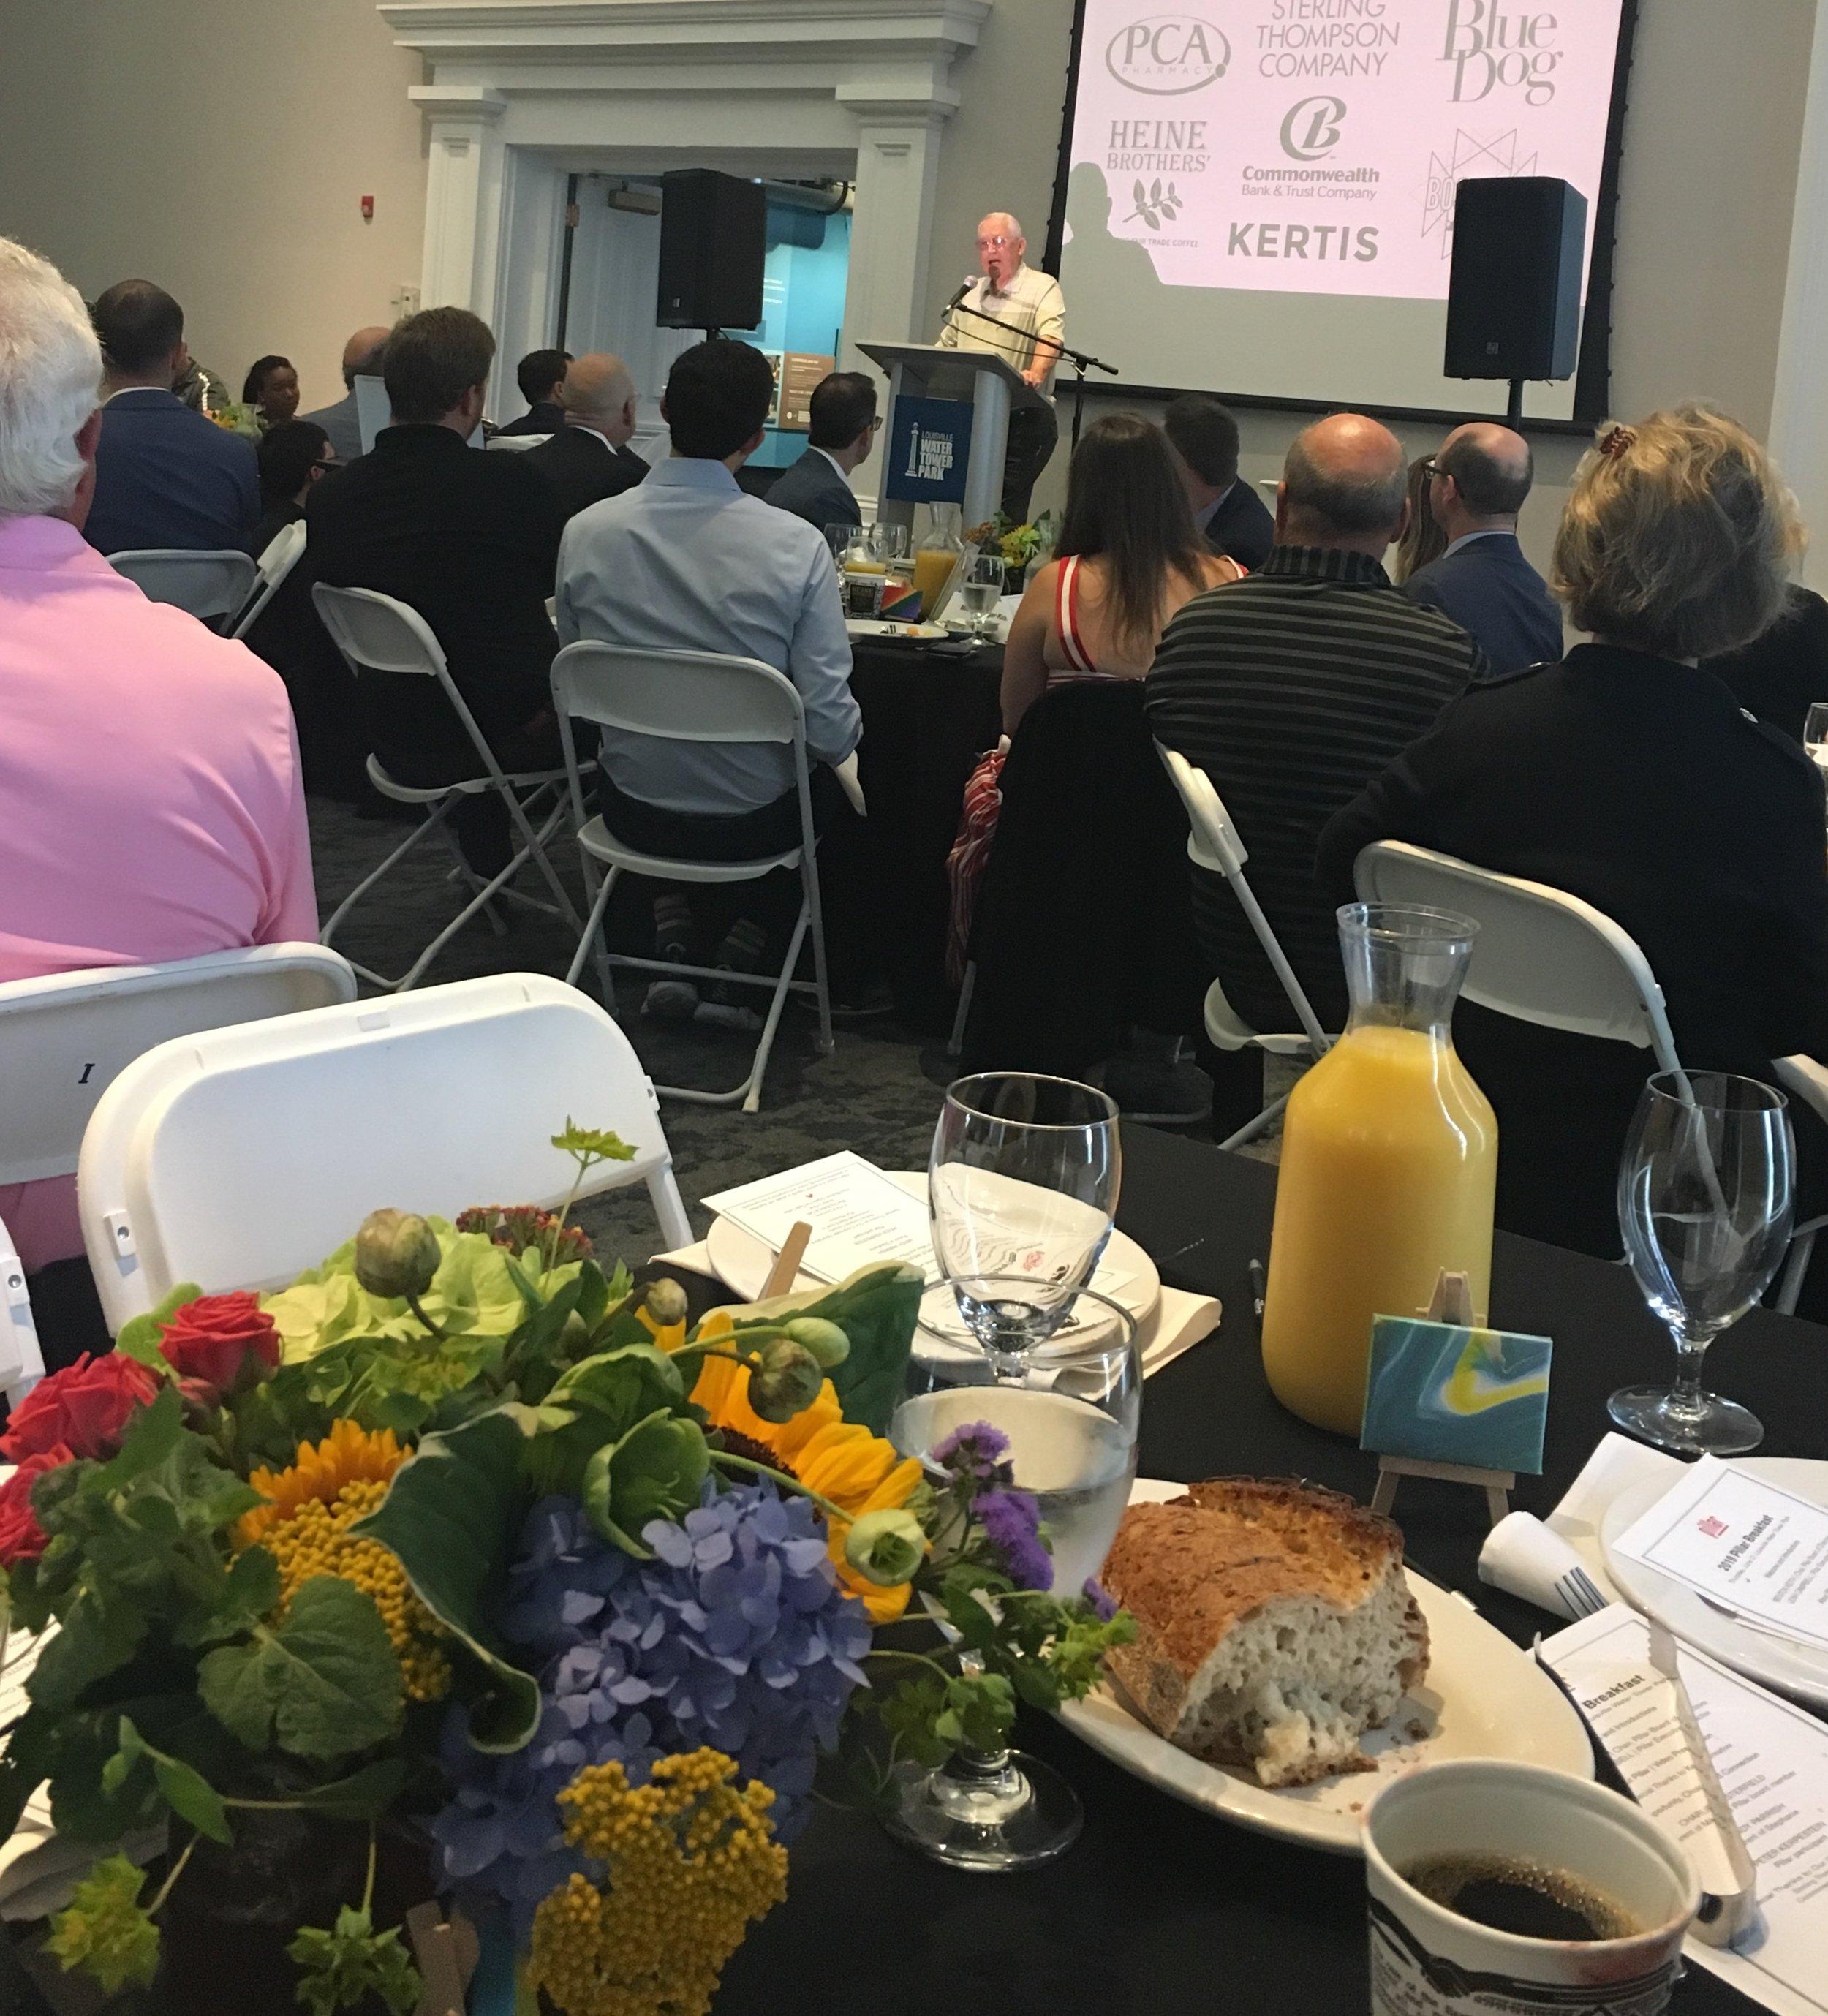 Pillar parent and board member Charlie Westerfield speaks at the Pillar Breakfast June 27.